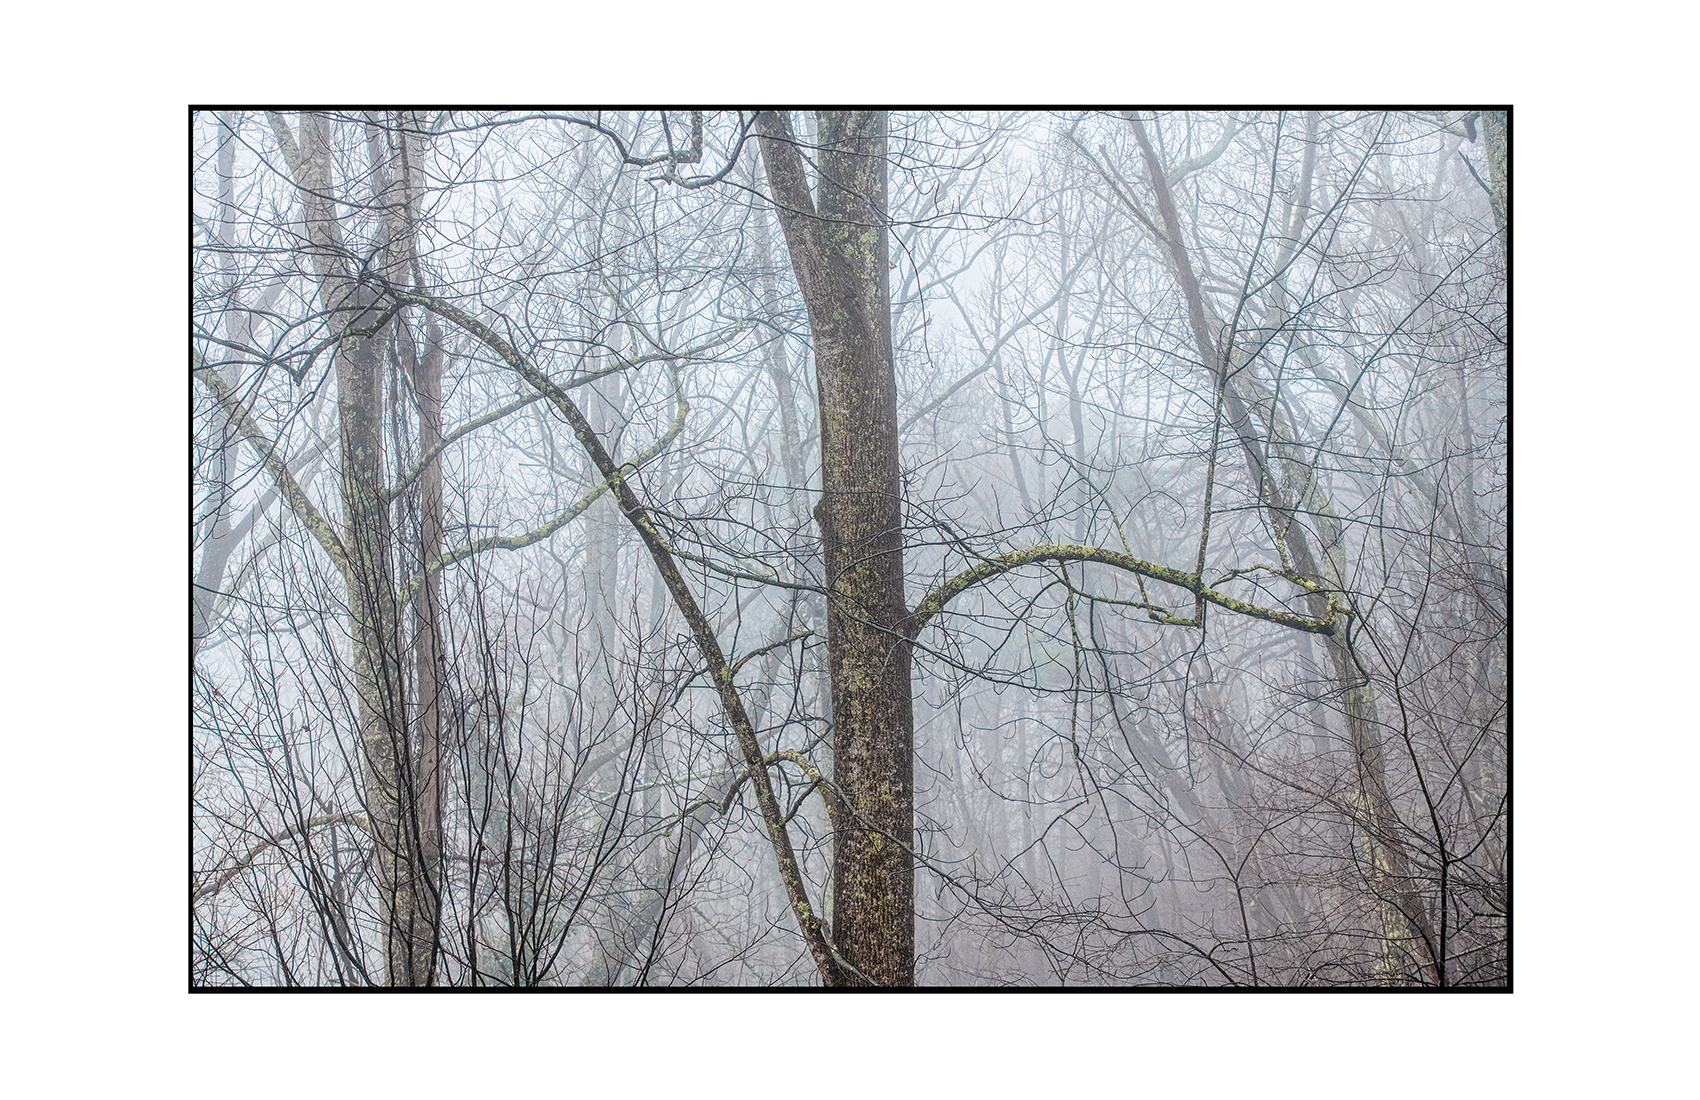 AppalachianForest19